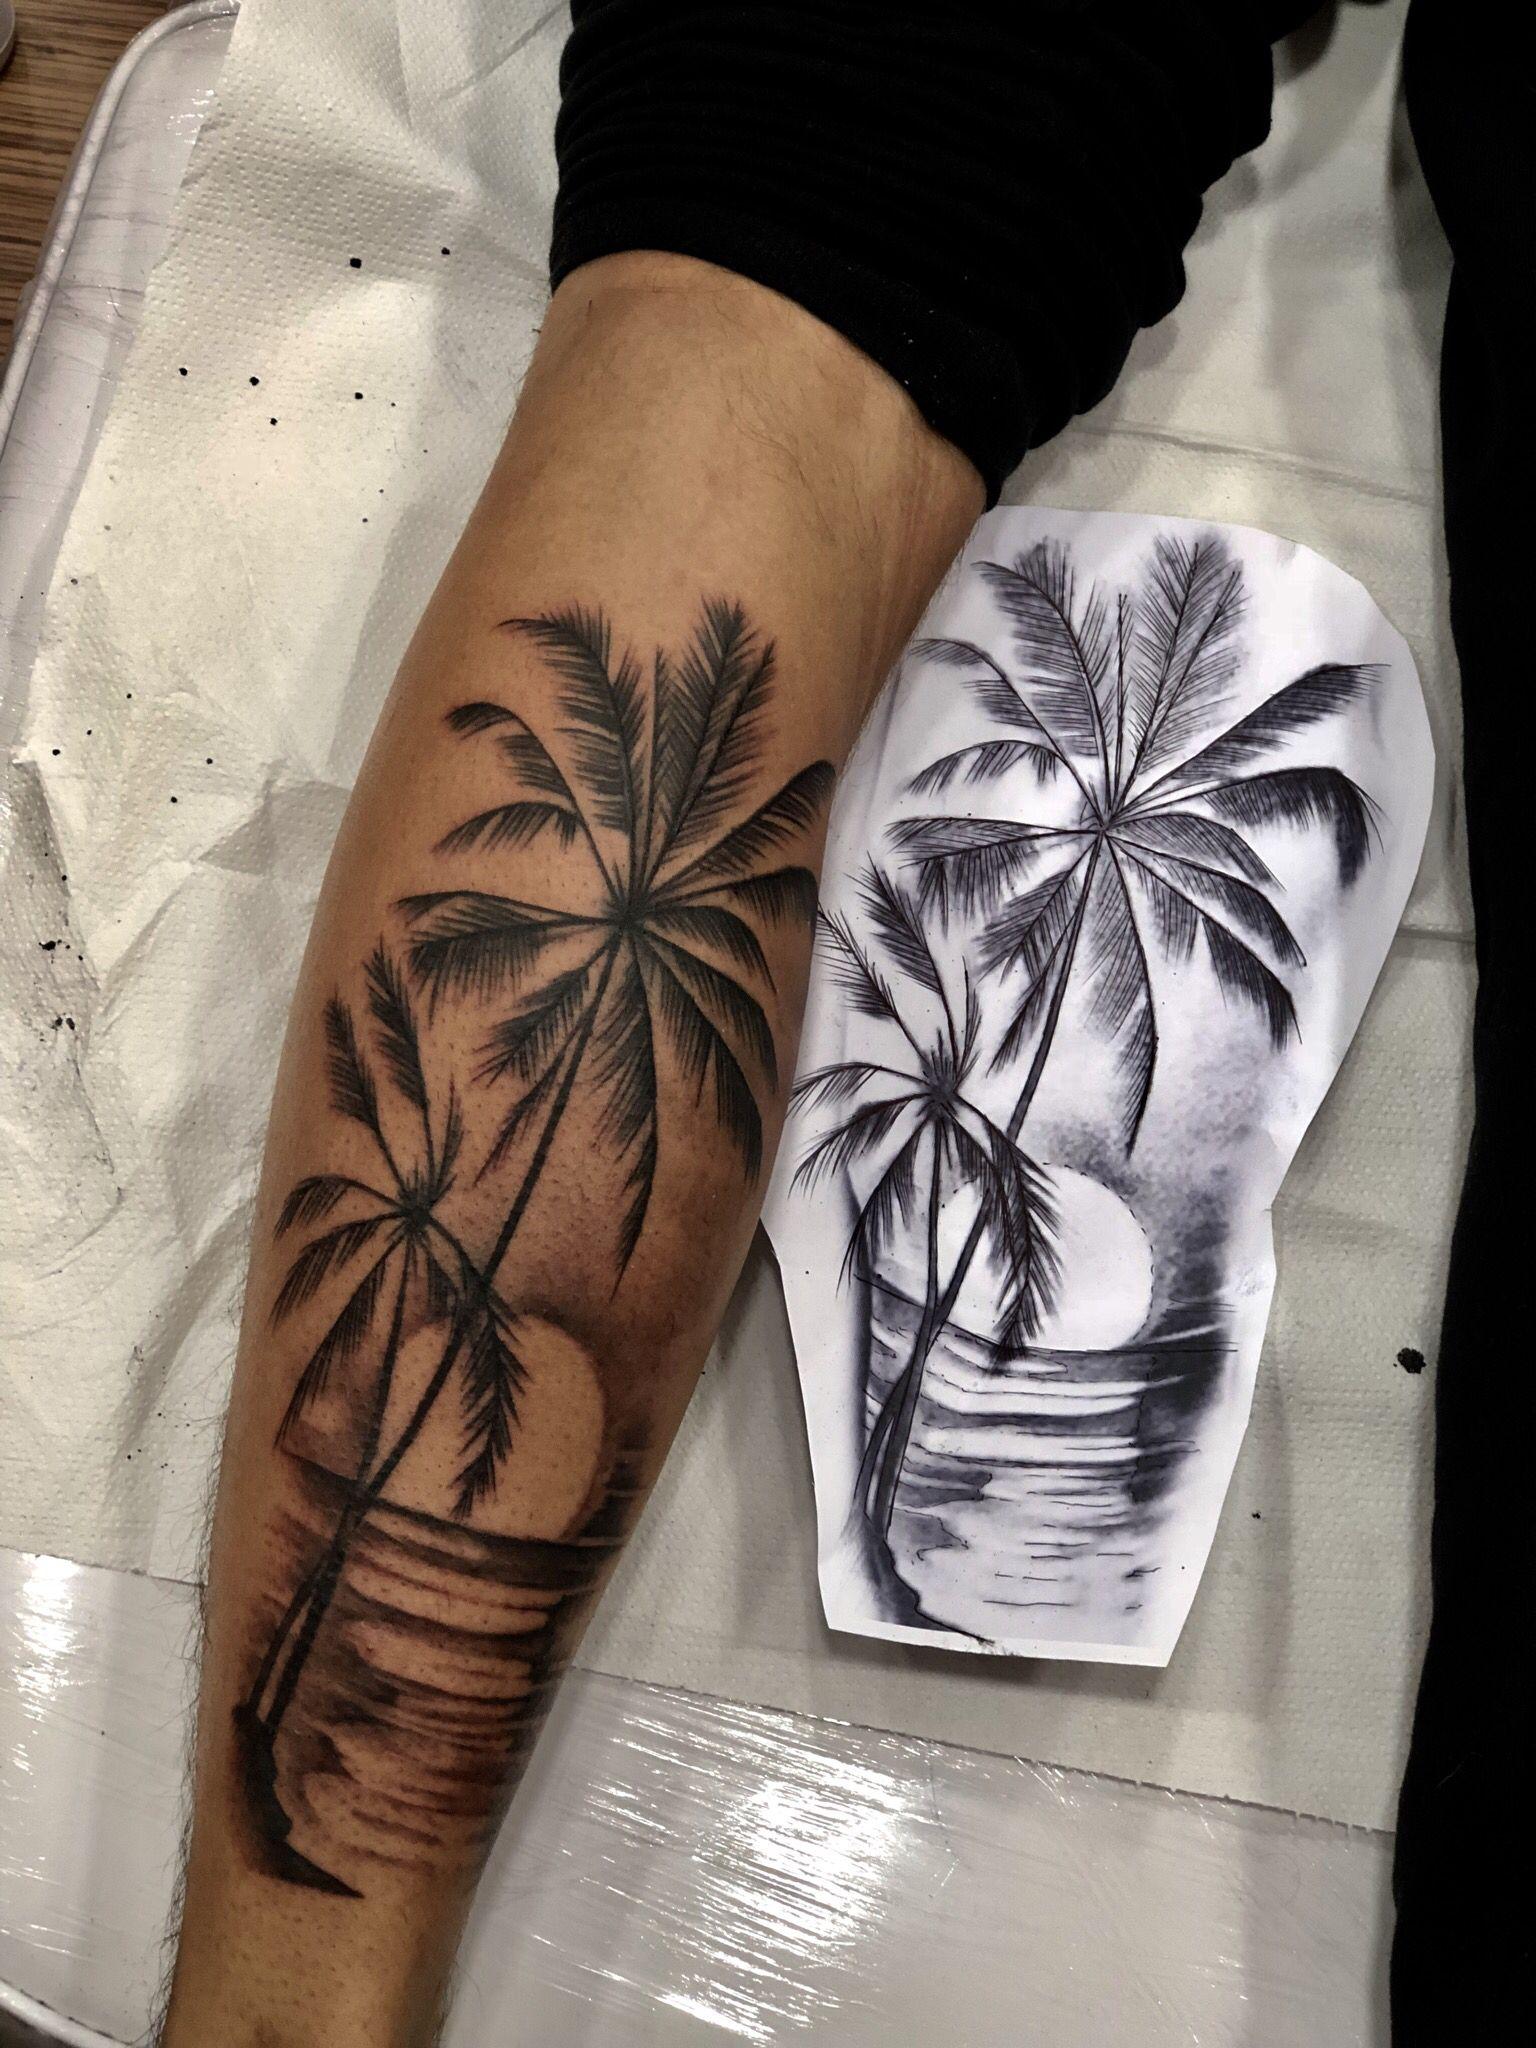 Tattoo palmera realismo javi_romero92 javierinktattoo